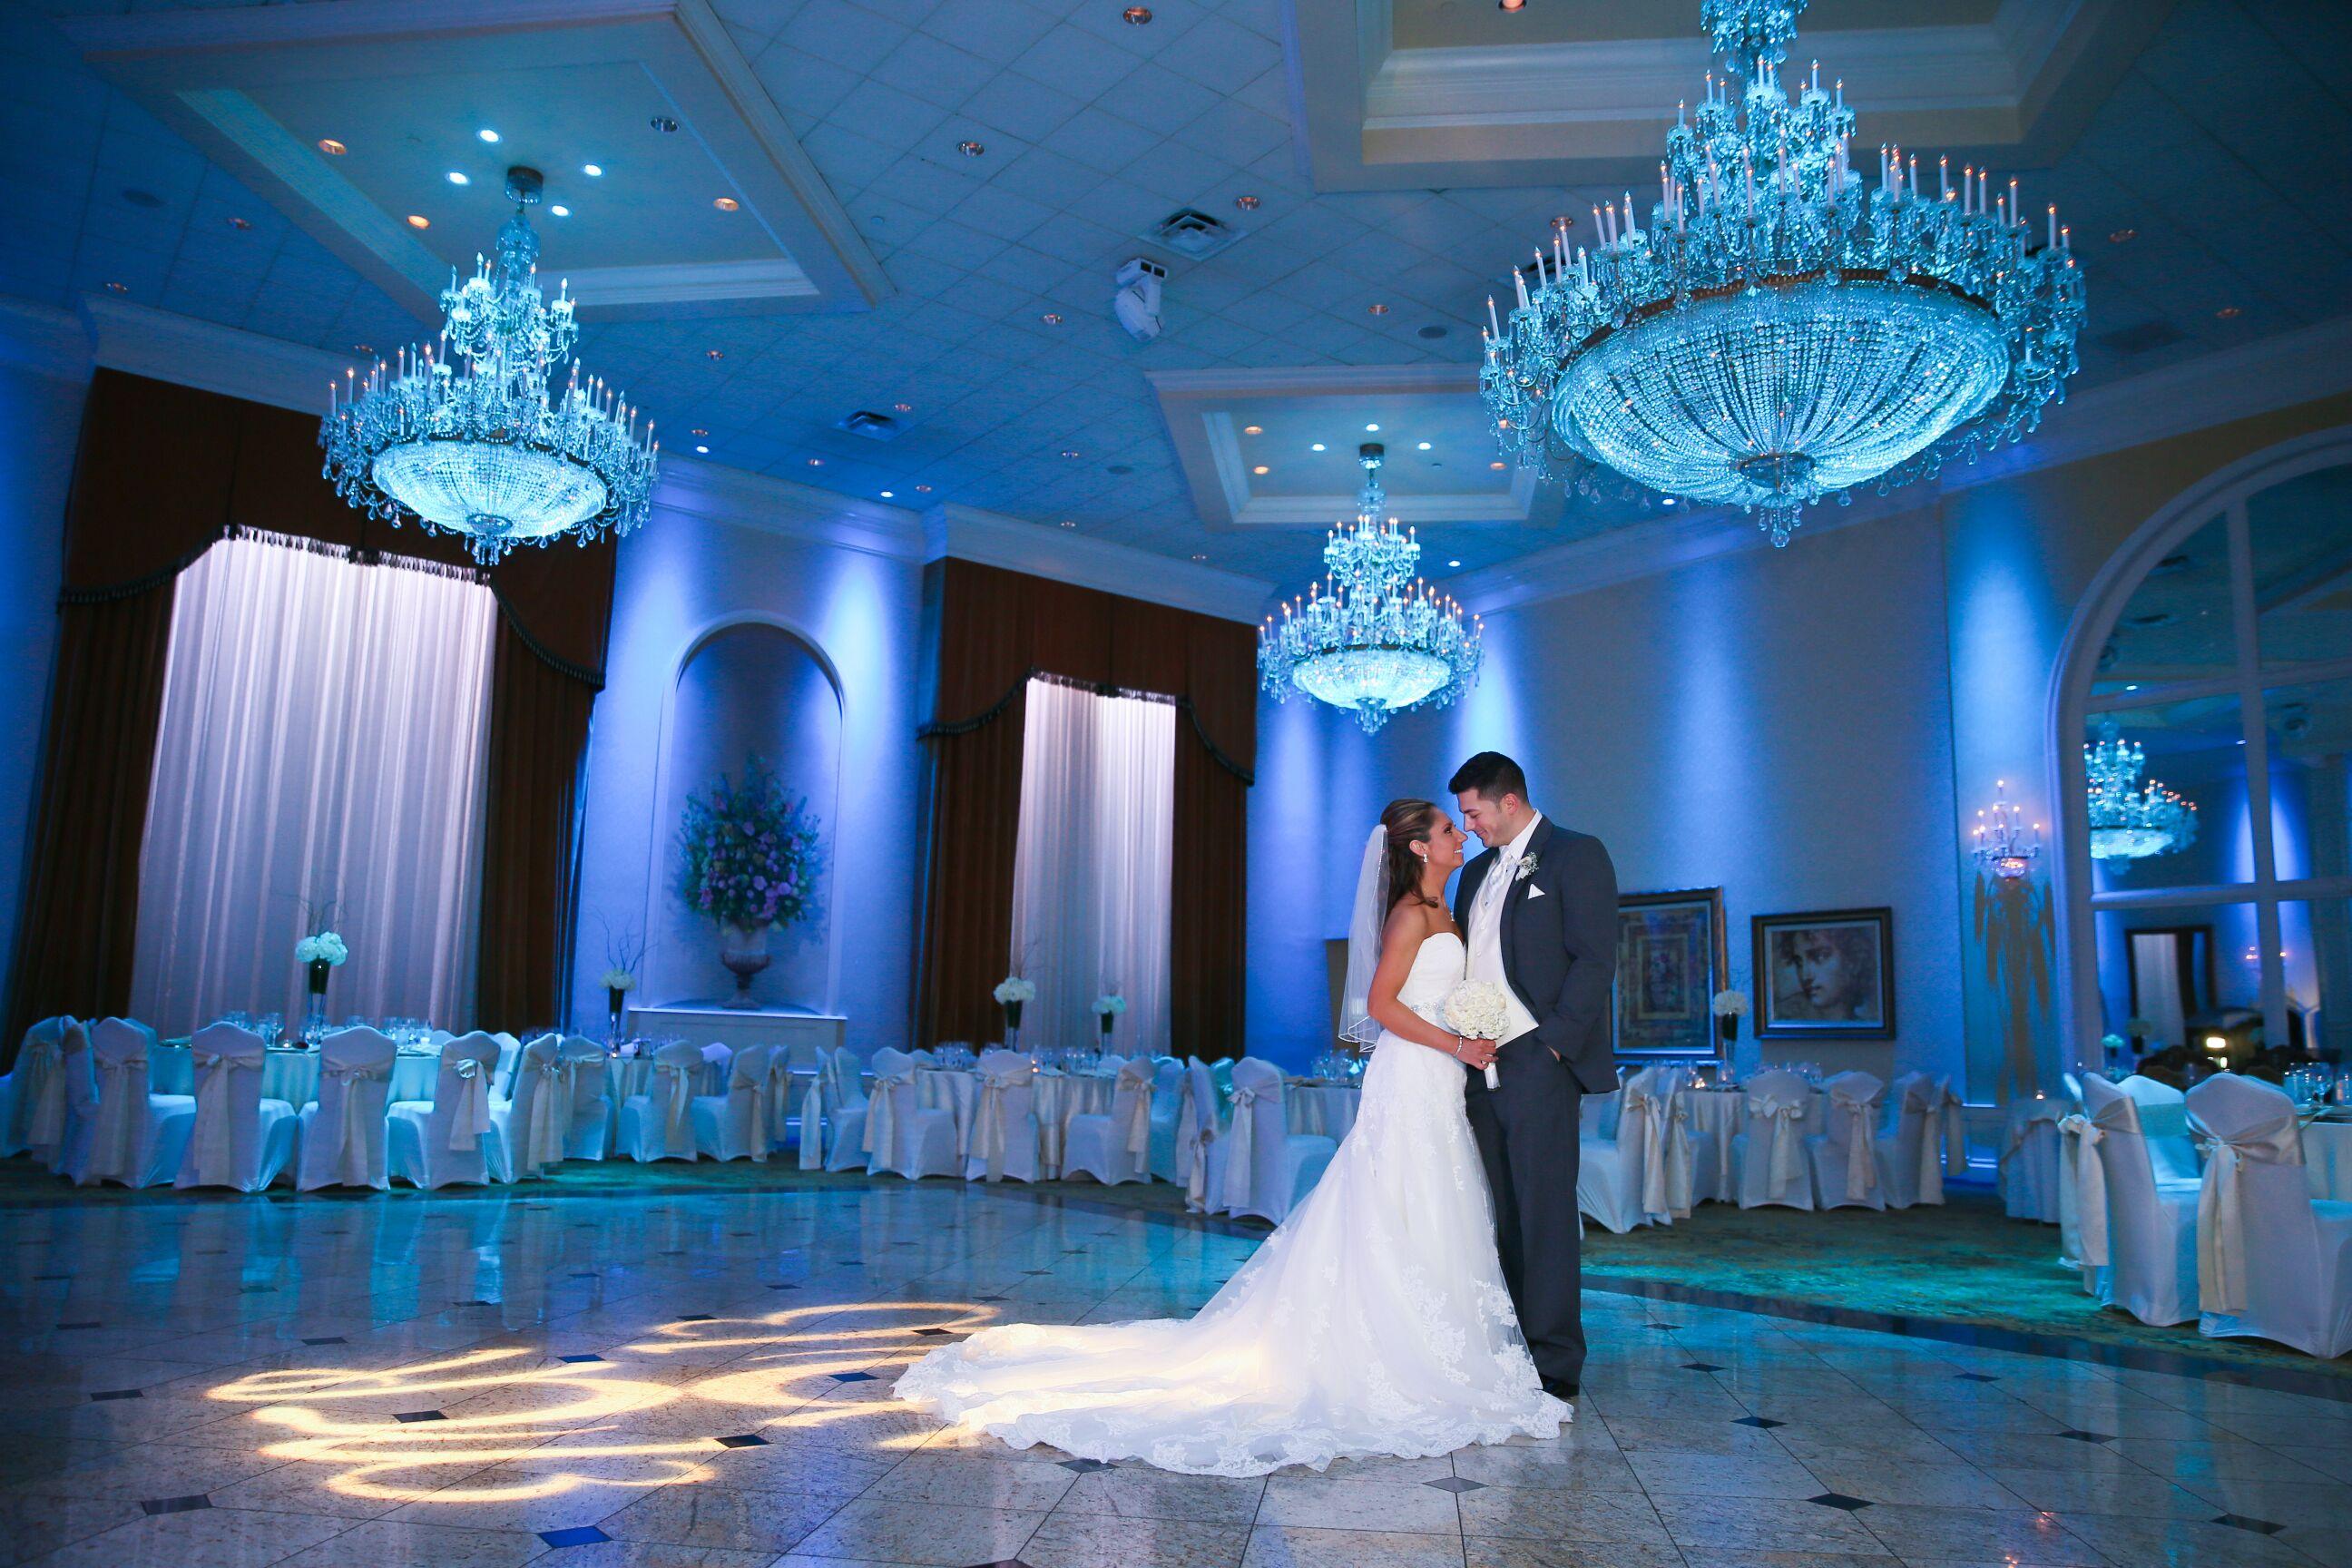 Wedding reception venues in newark nj the knot il villaggio exclusive weddings junglespirit Gallery